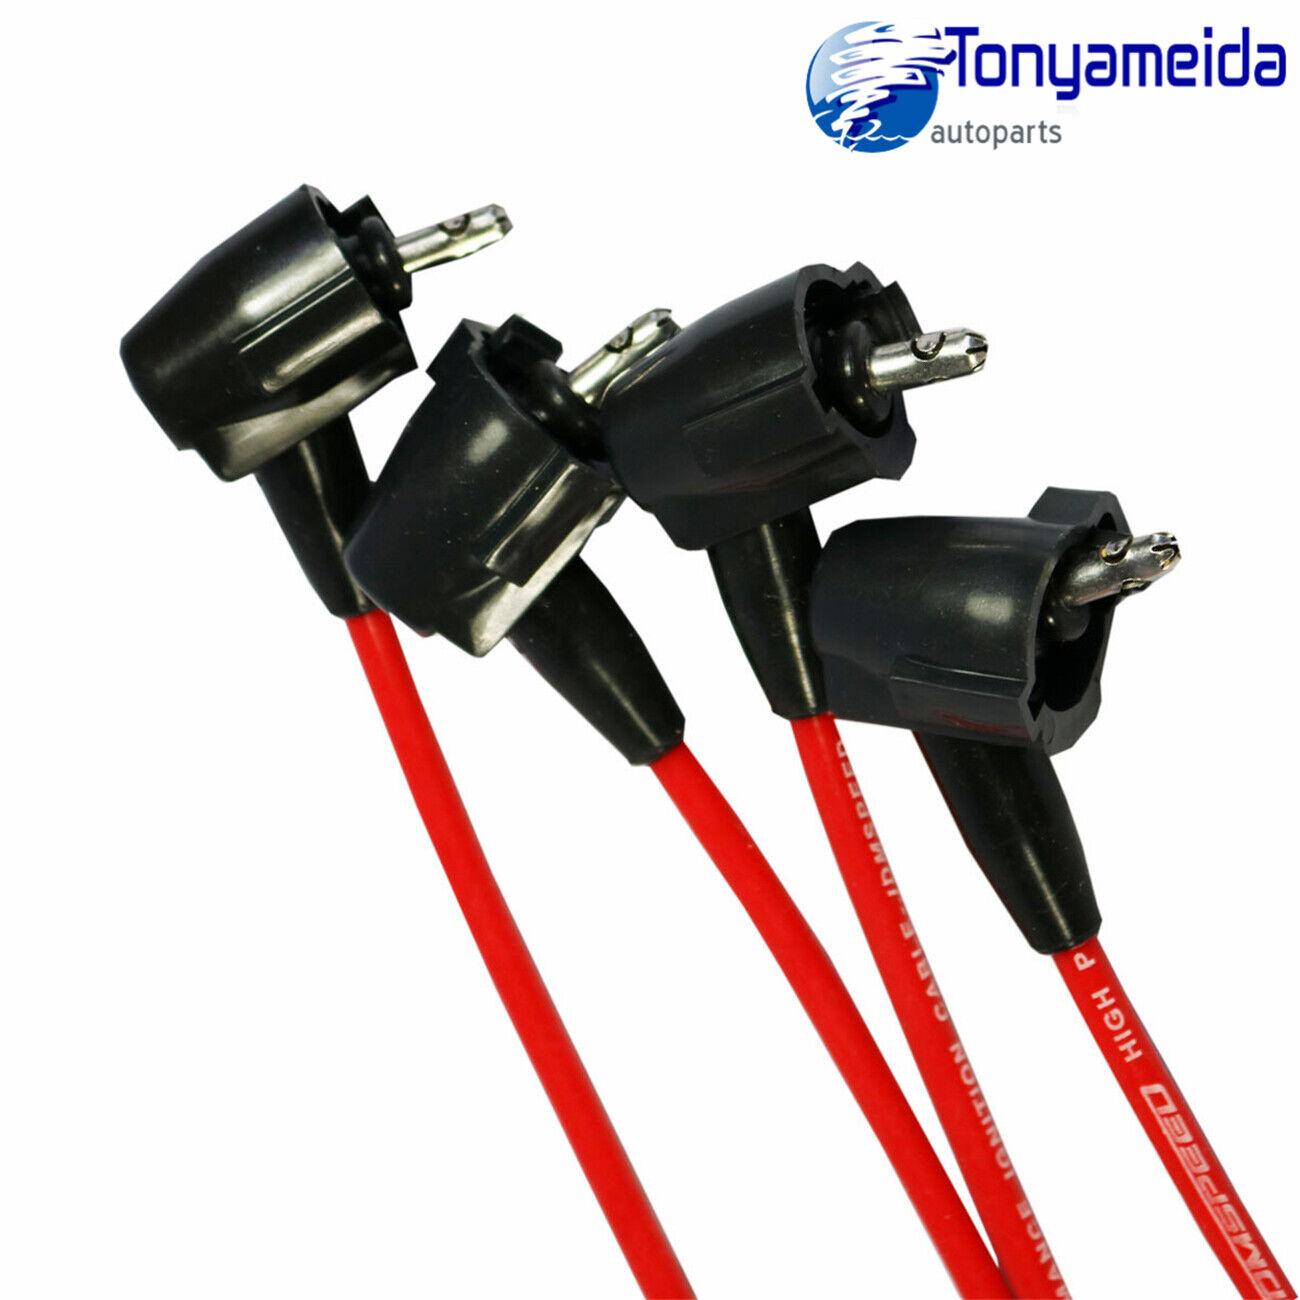 Spark Plug Wires 671-4168 For Geo Prizm Toyota Celica ...